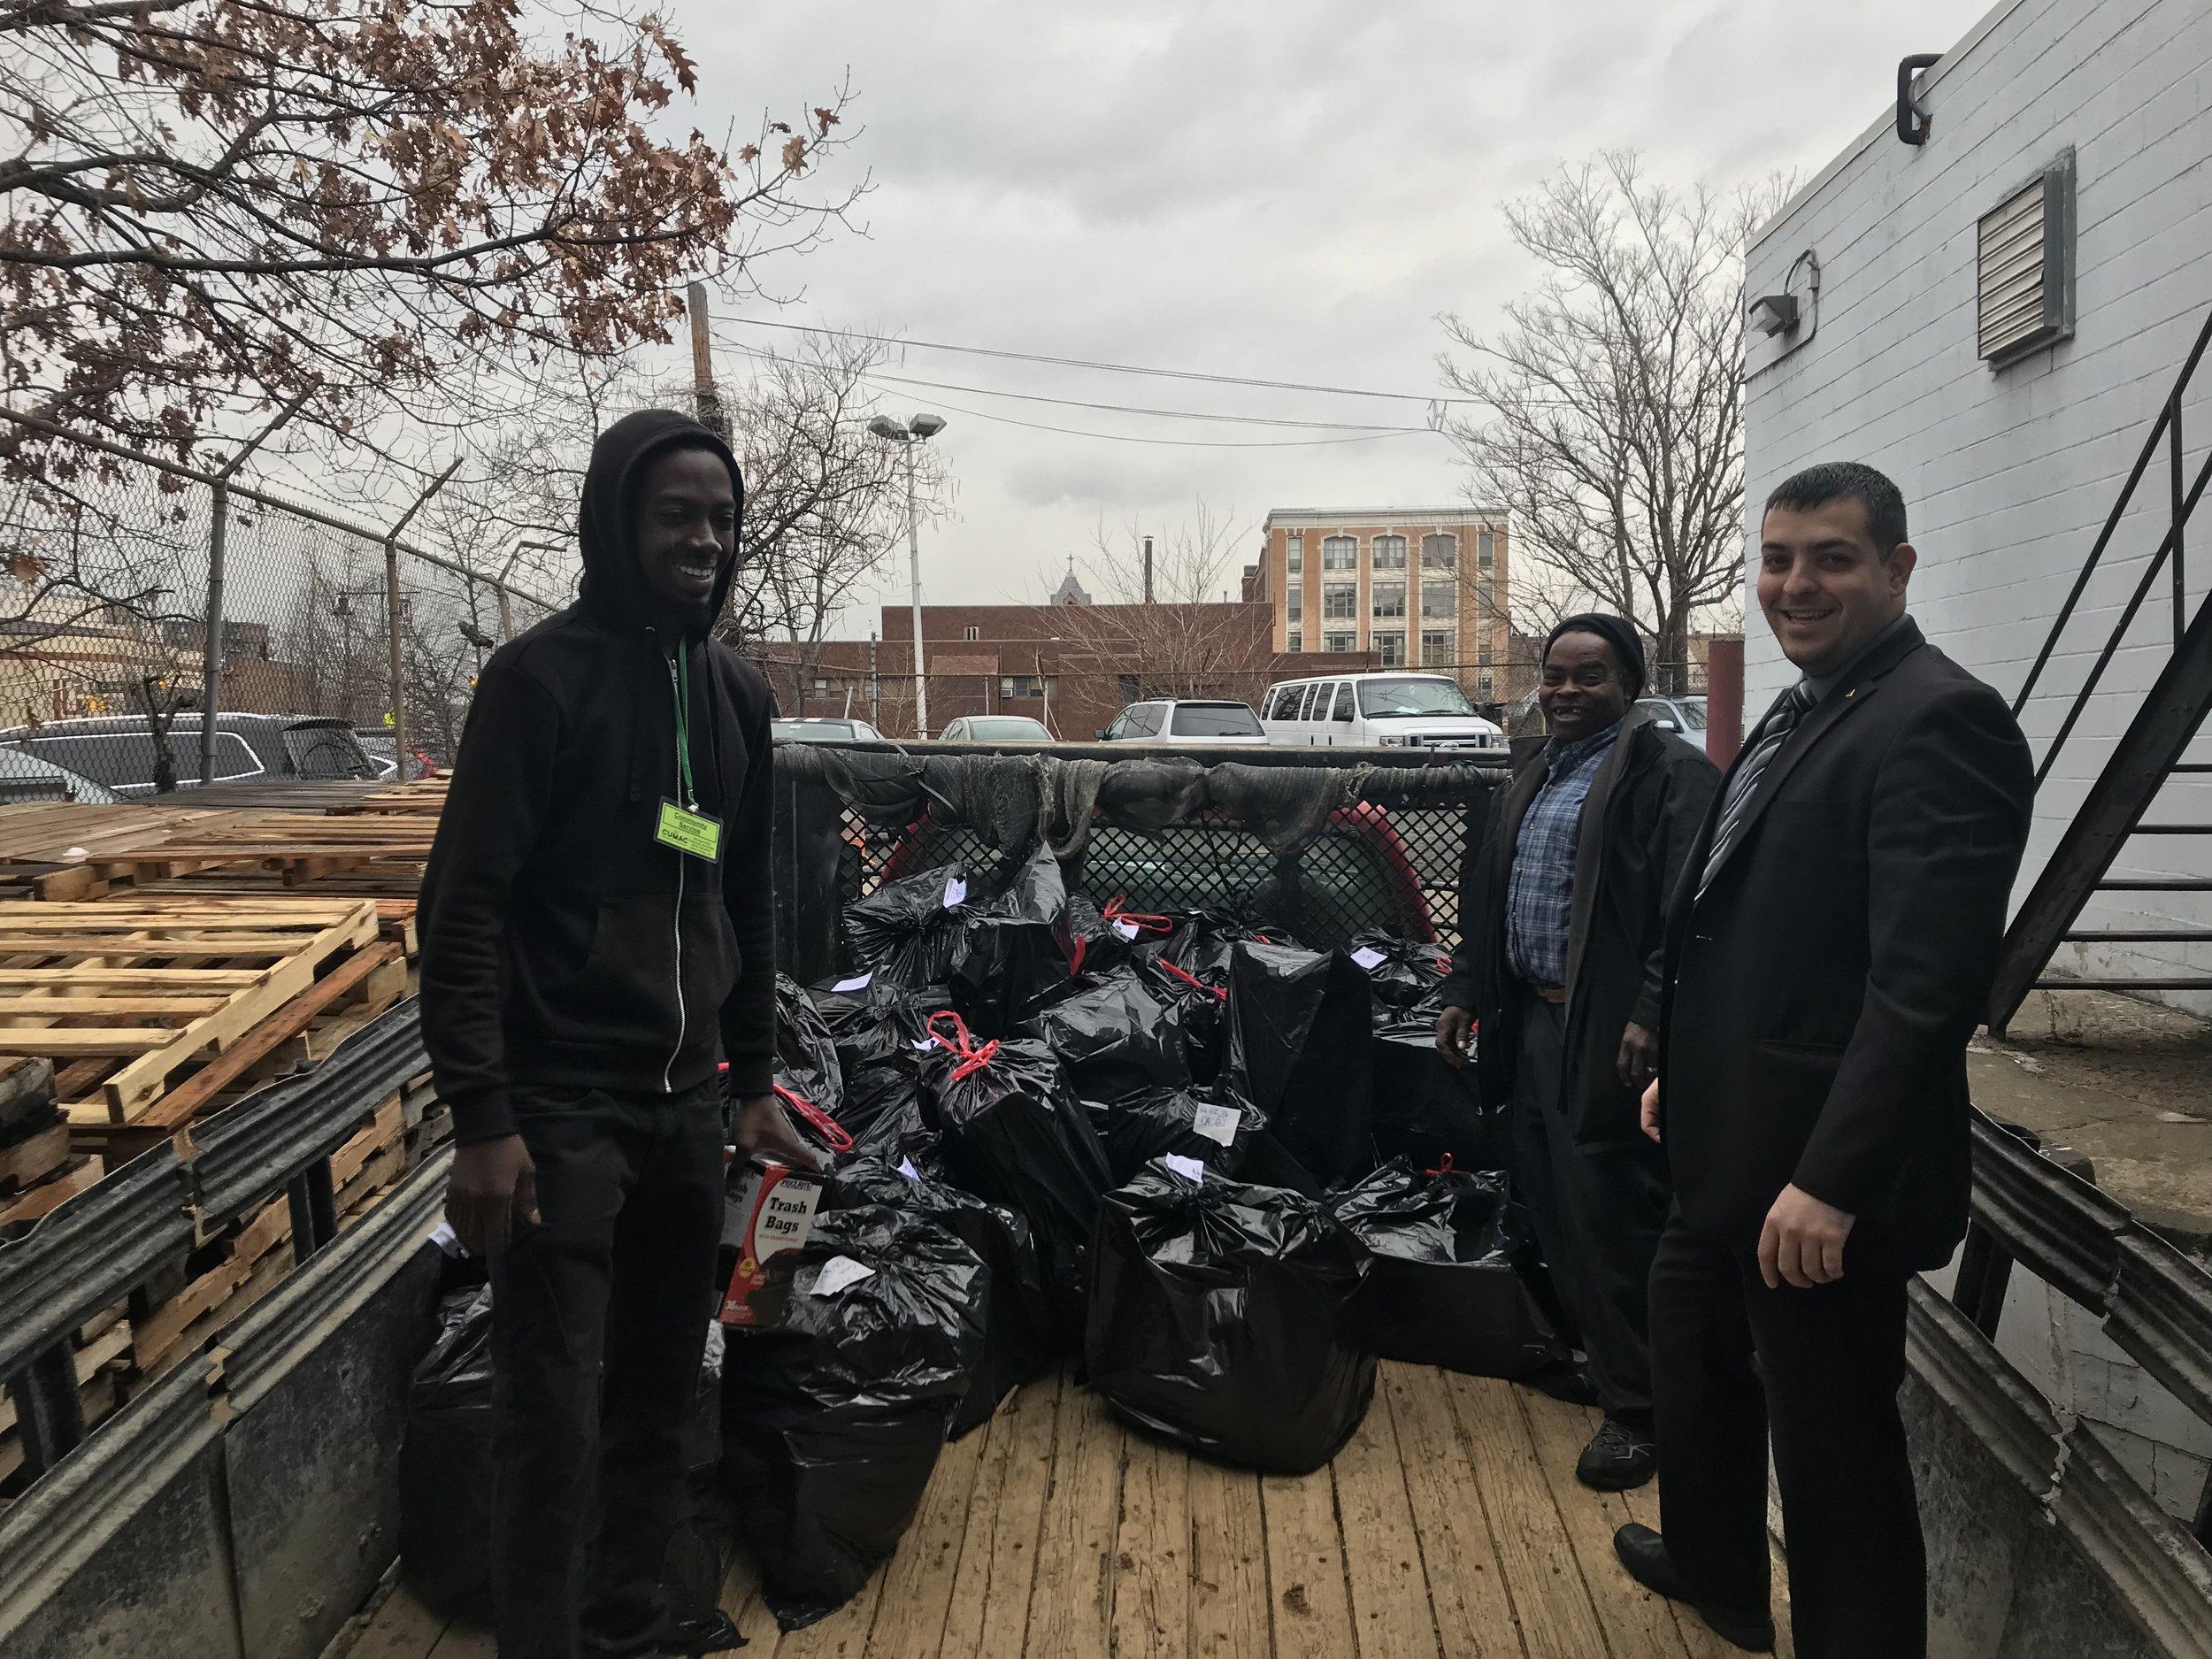 CUMAC donated a truck full of gifts